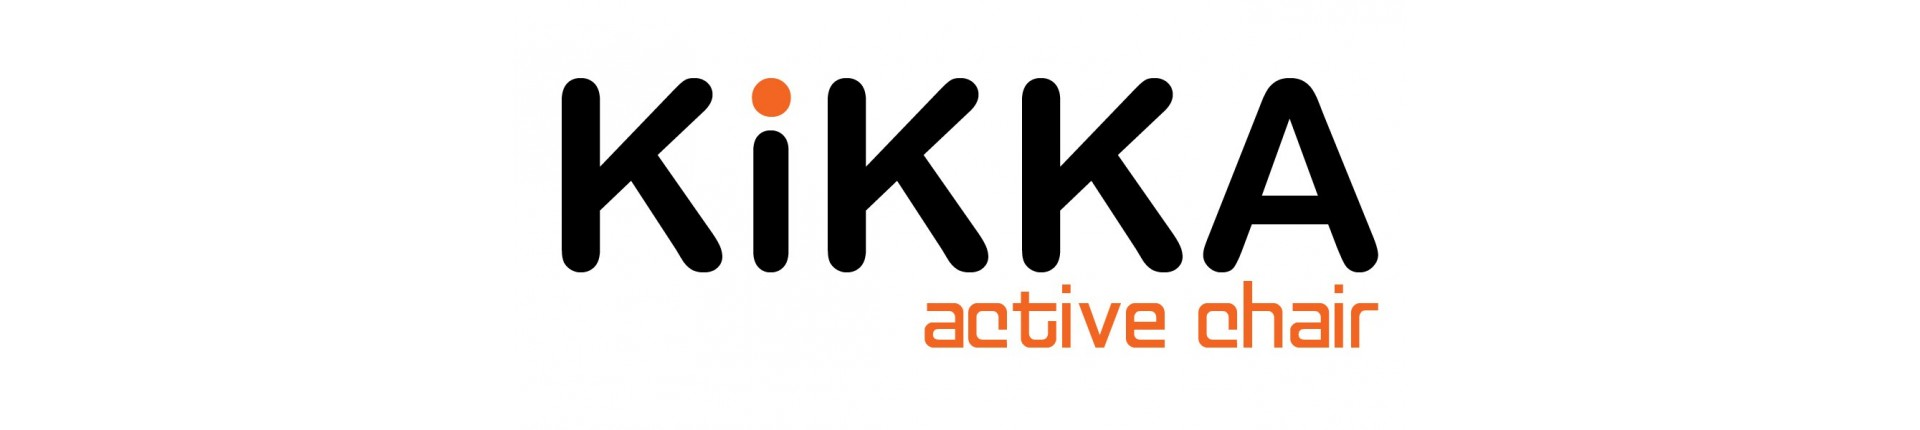 Kikka Active Chair